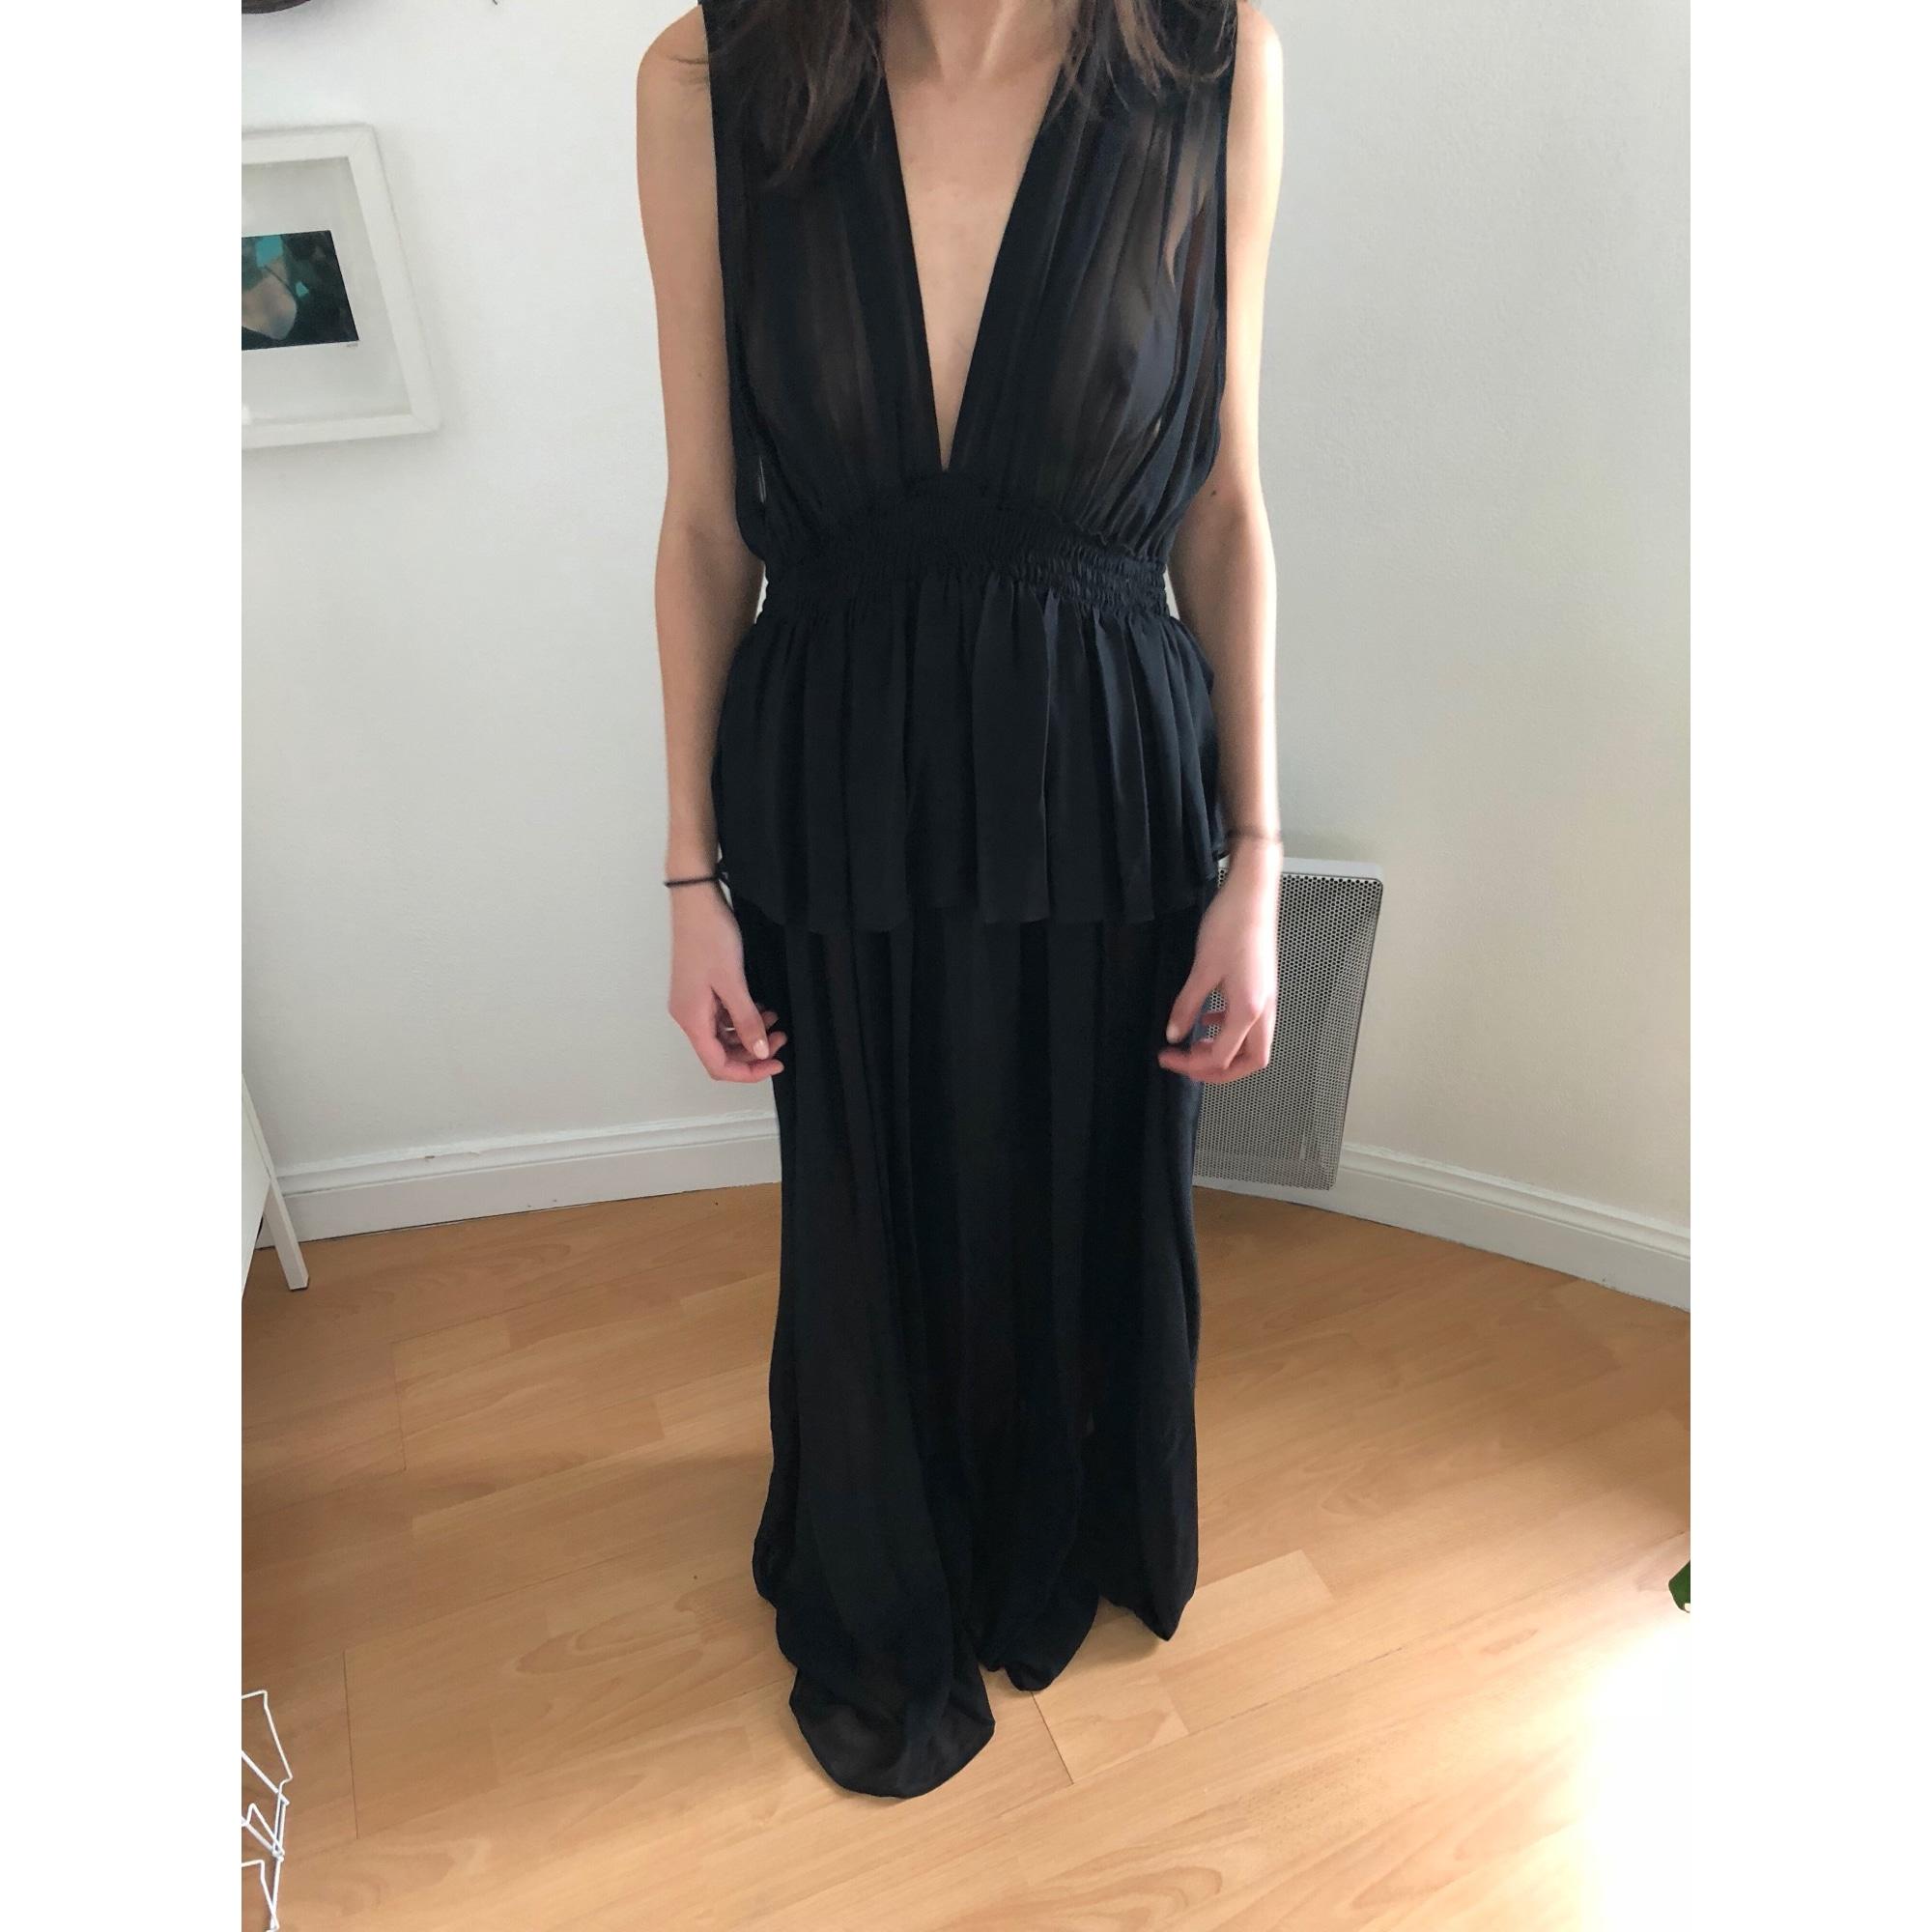 Robe Longue Vanessa Bruno 42 L Xl T4 Noir 7286851